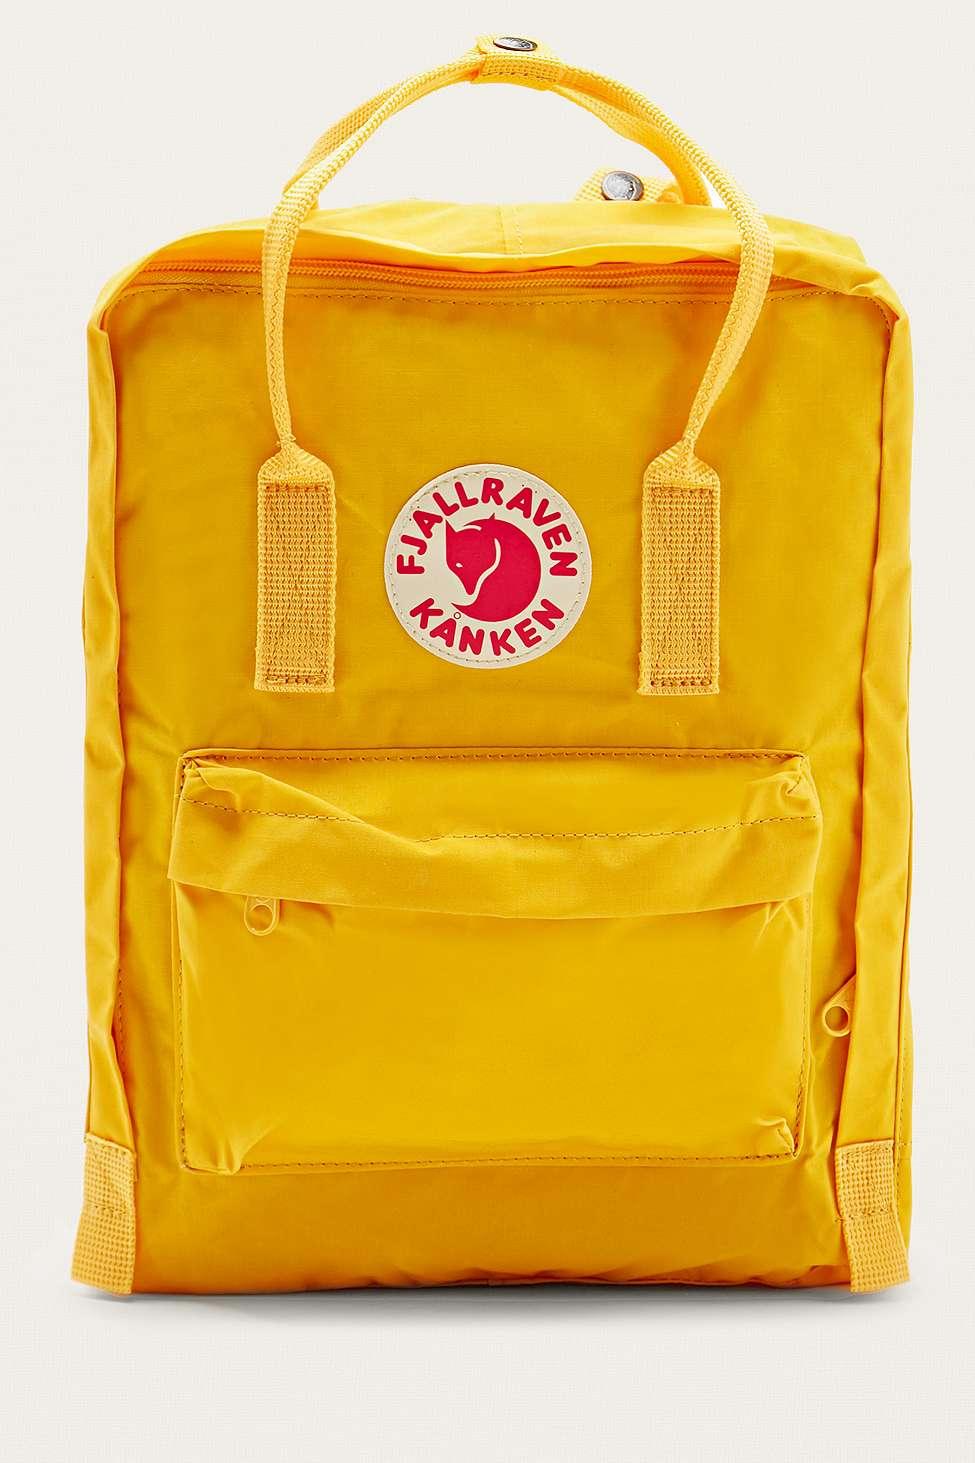 Fjallraven Kanken Classic Warm Yellow Backpack Urban